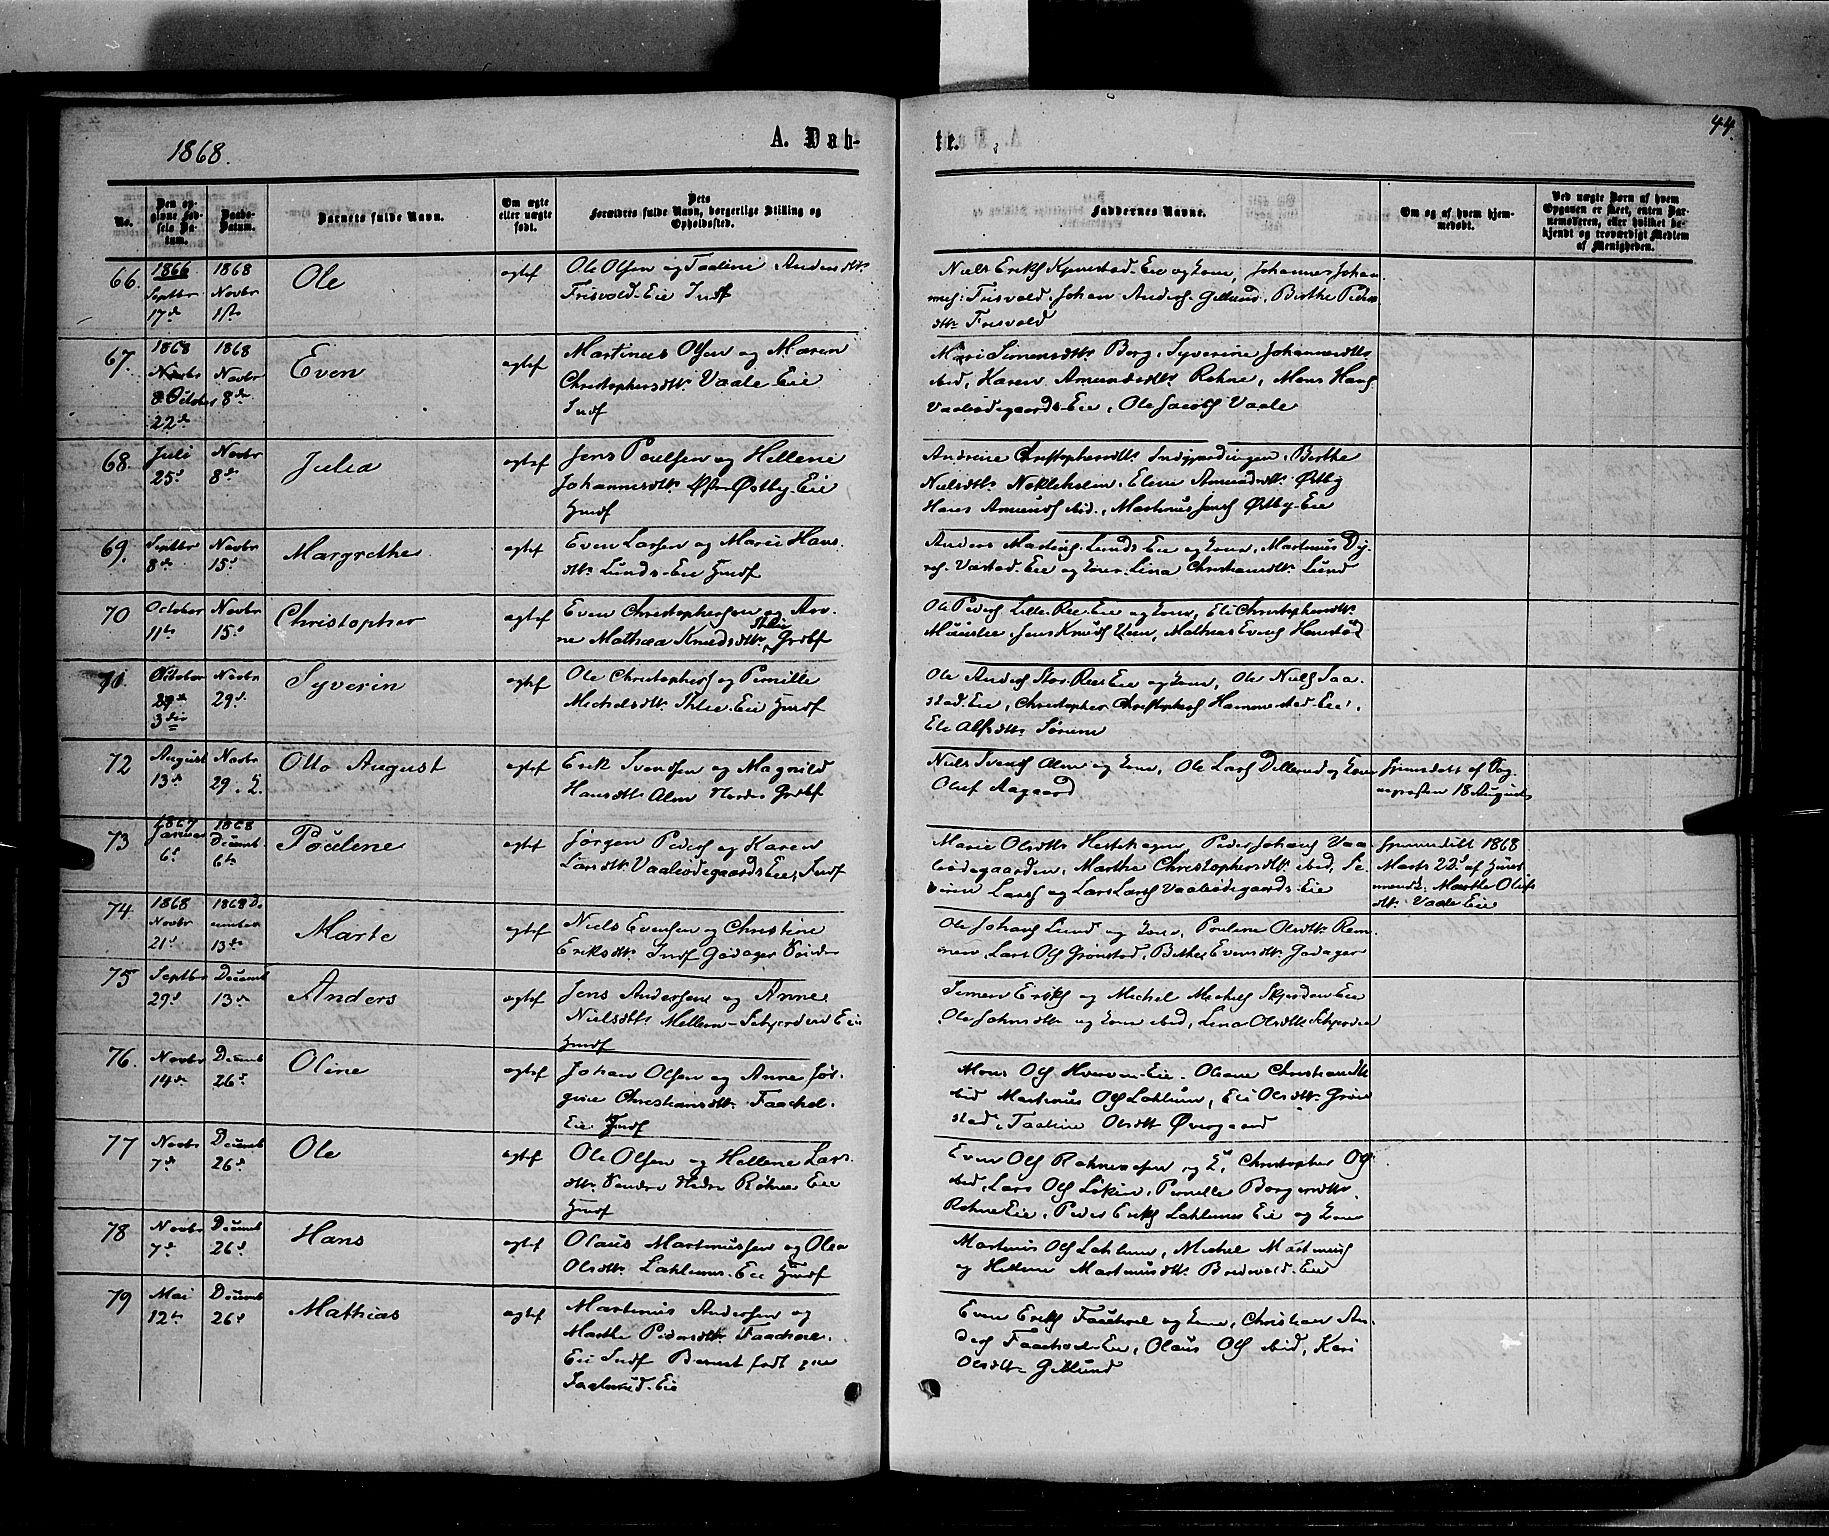 SAH, Stange prestekontor, K/L0013: Ministerialbok nr. 13, 1862-1879, s. 44